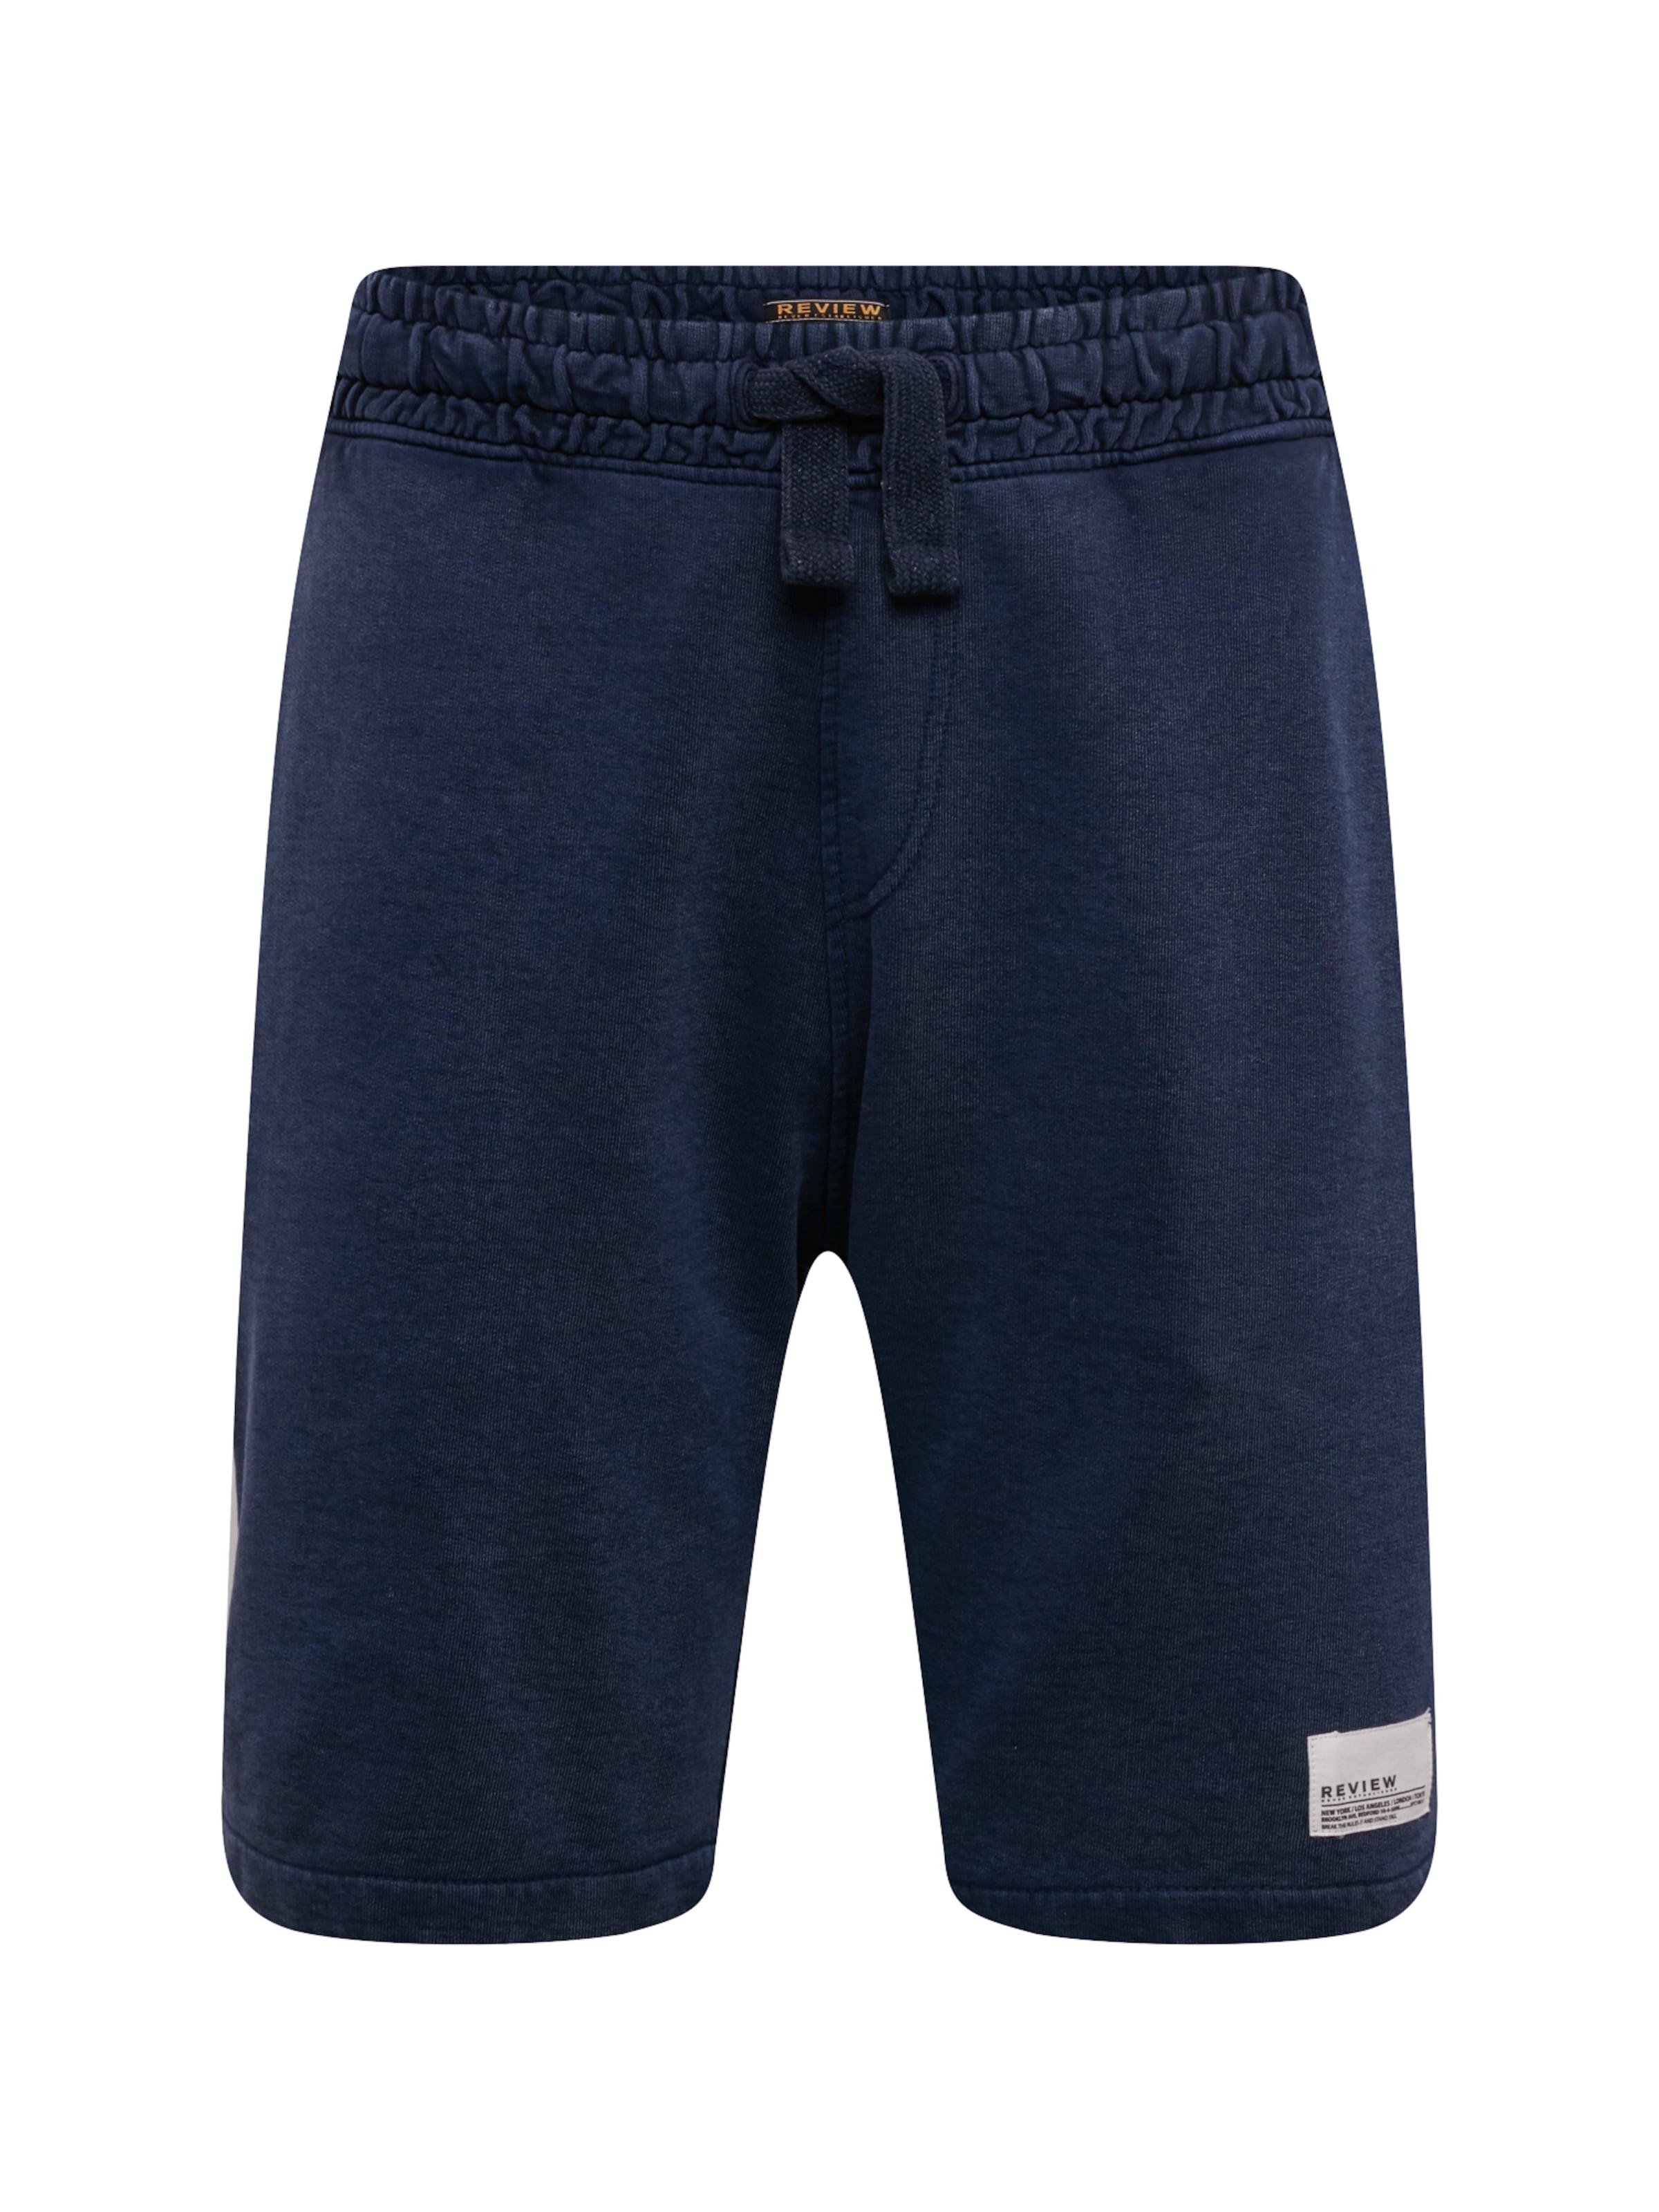 'shorts Easy' Navy In Broek Review 0OnkPw